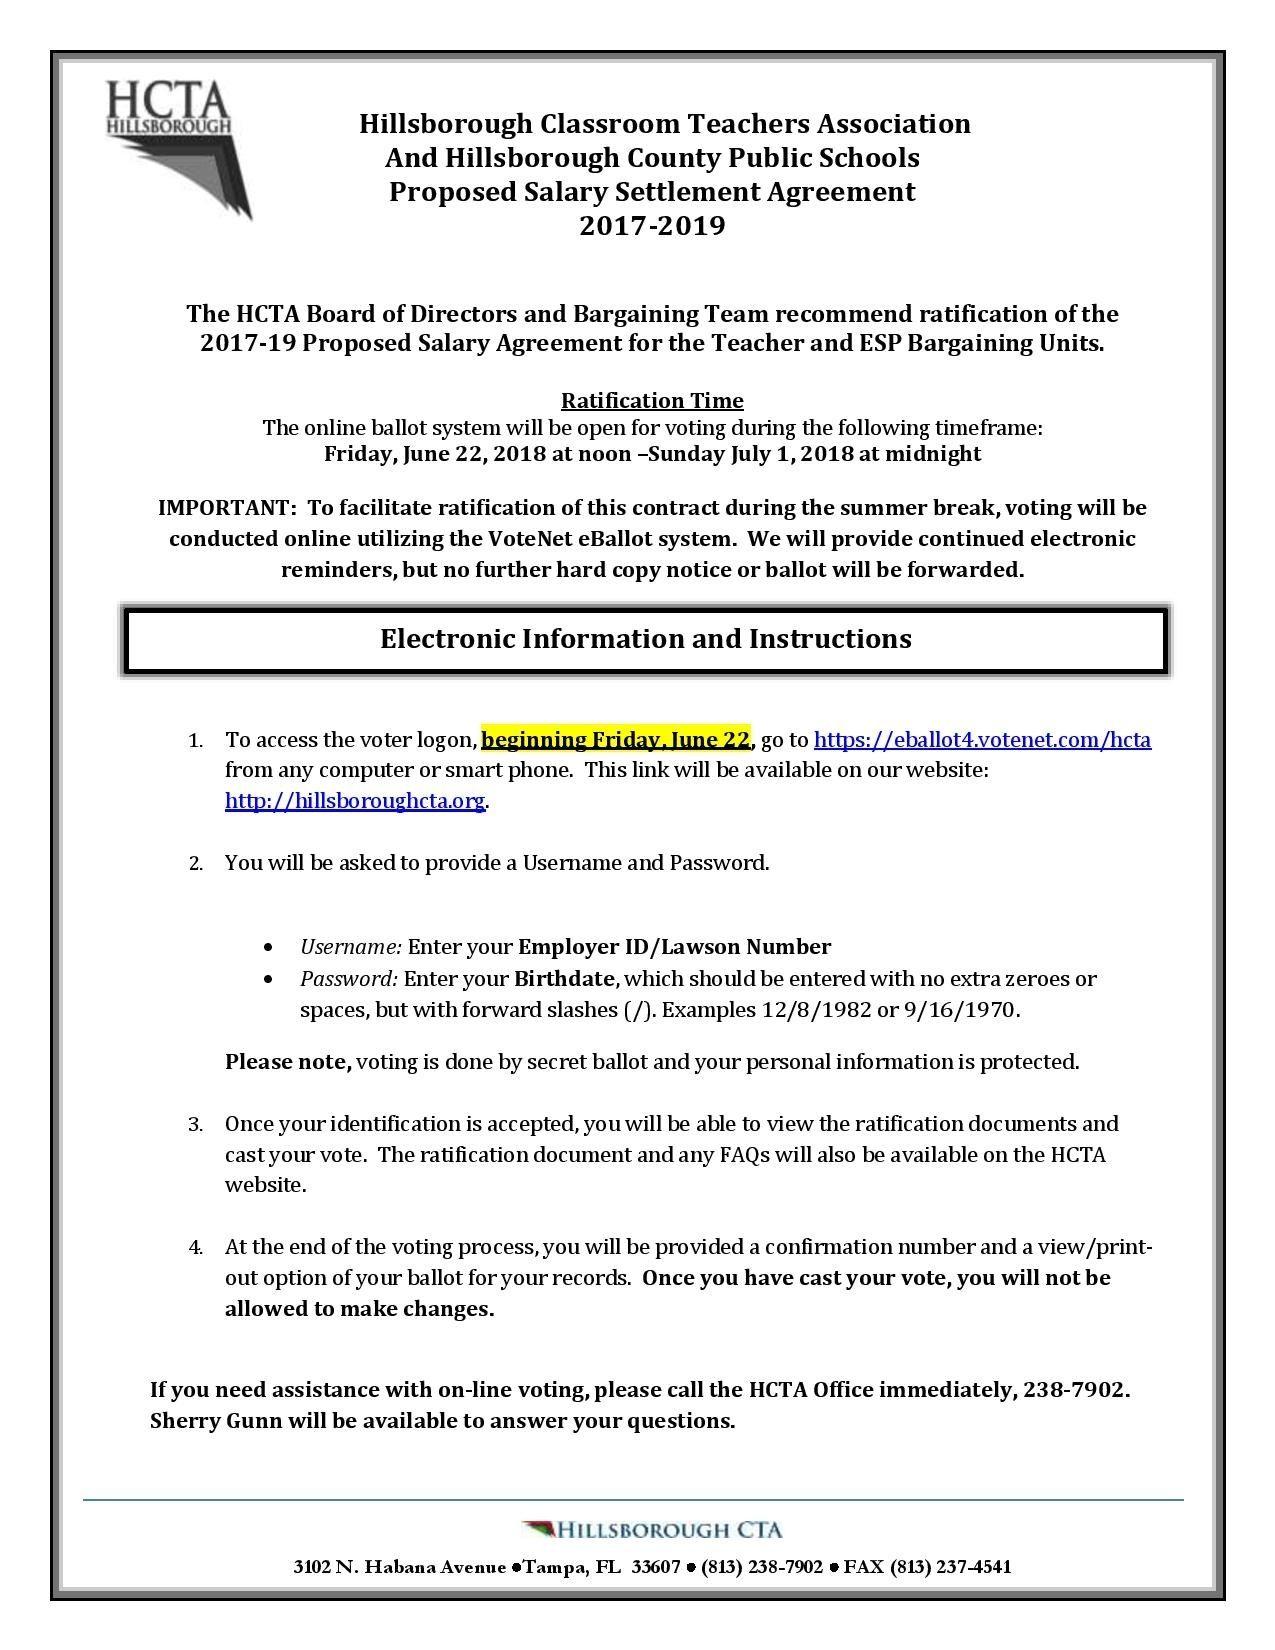 Remarkable School Calendar Hillsborough 2019 In 2020 School Calendar Homeschool Calendar Teacher Association